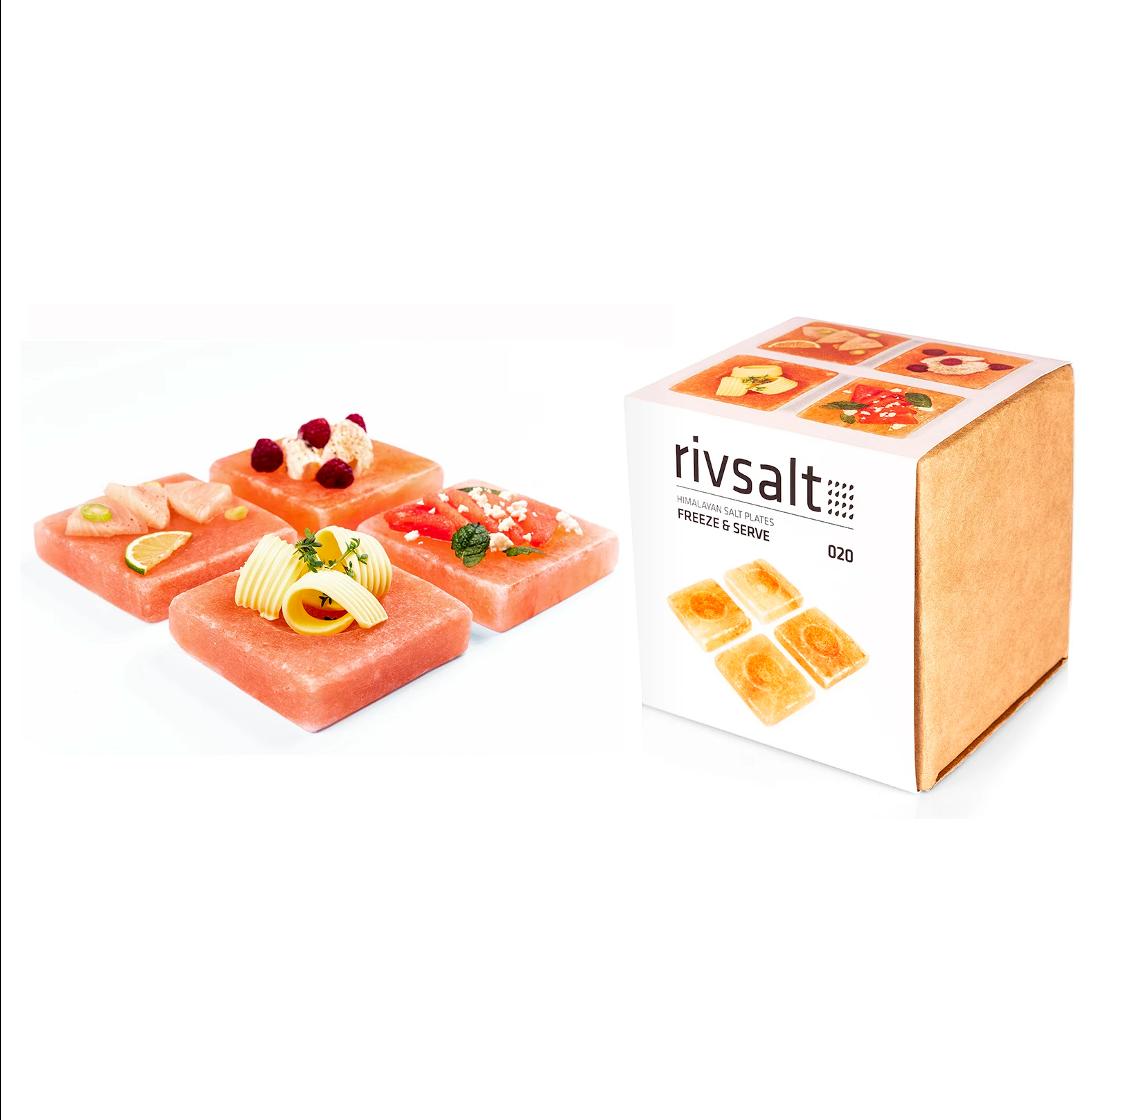 Rivsalt Freeze & Serve - 4 Himalayan Salt Plates